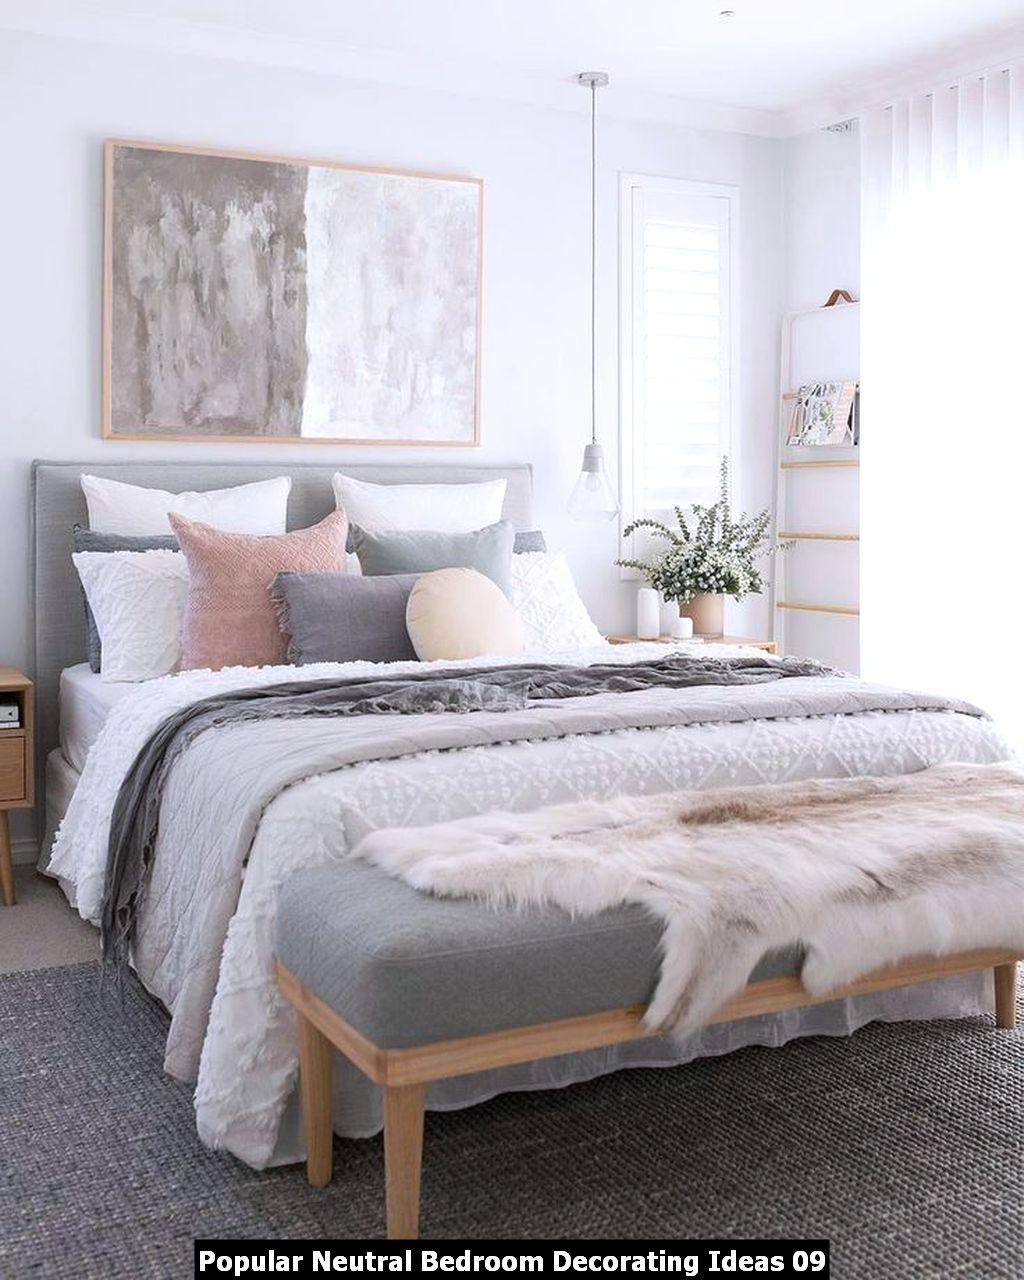 Popular Neutral Bedroom Decorating Ideas 09